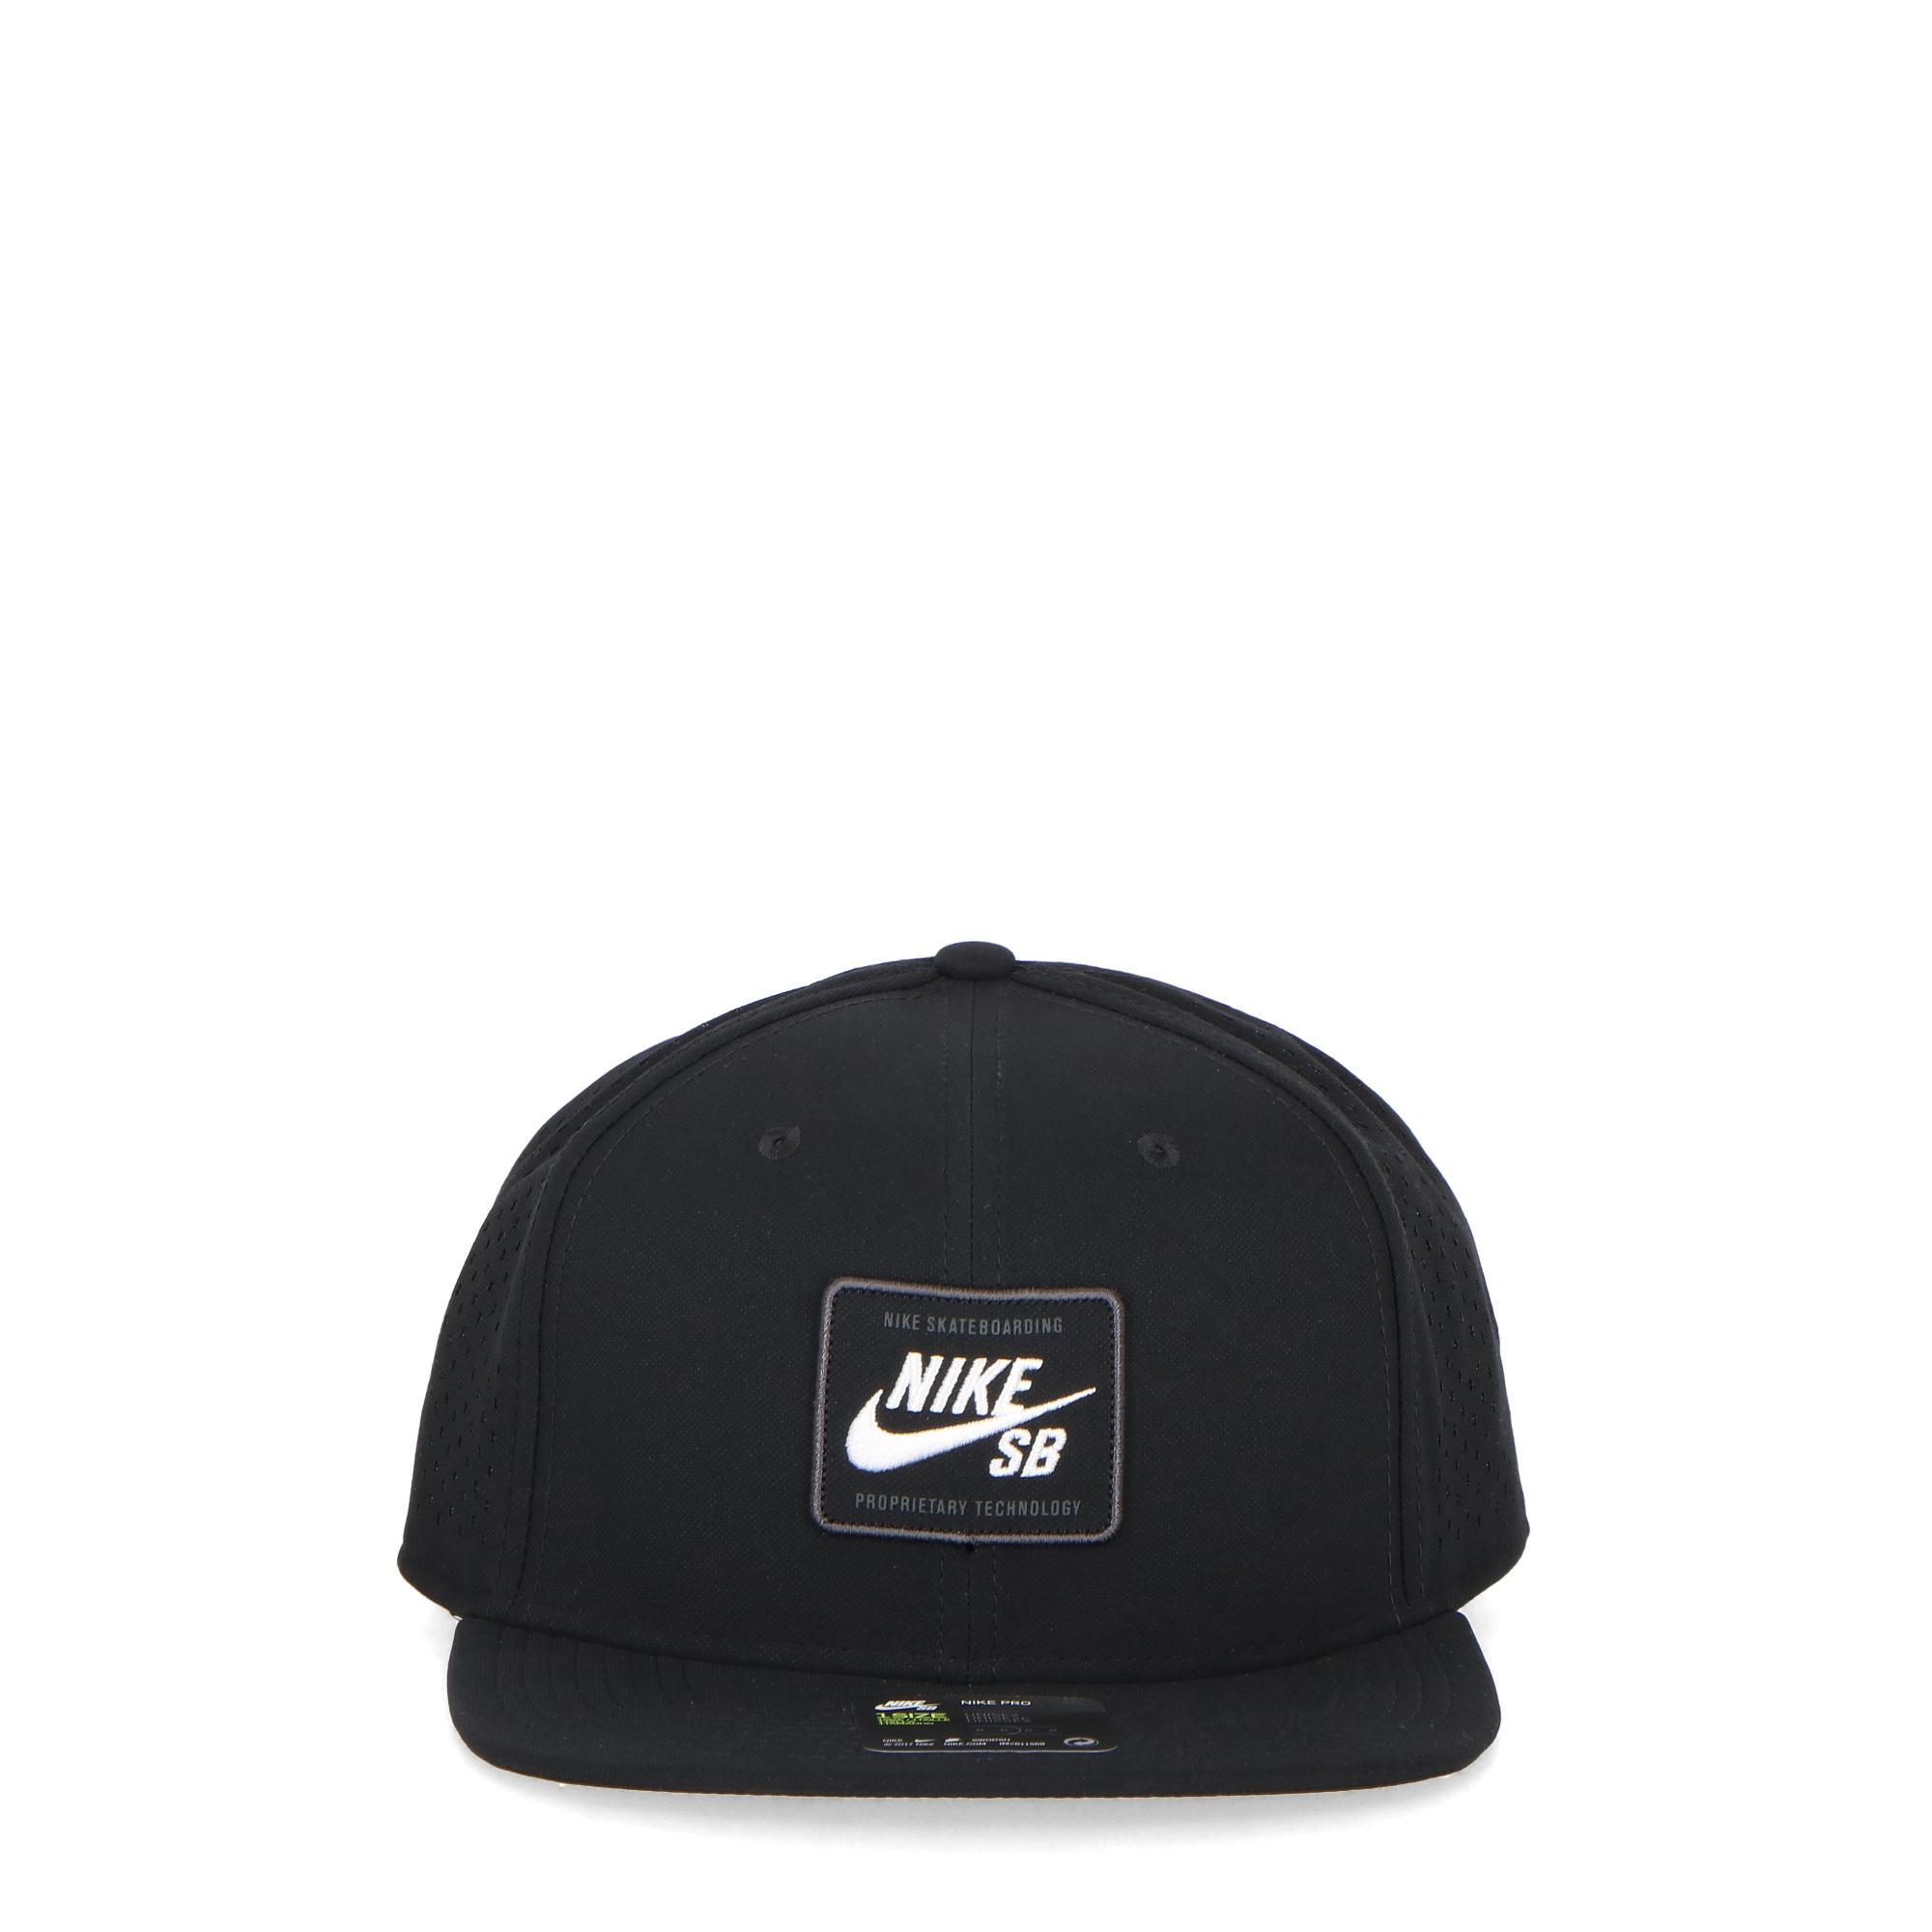 premium selection 7043f e8f3f Nike Sb Arobill Pro Cap 2.0 Black white